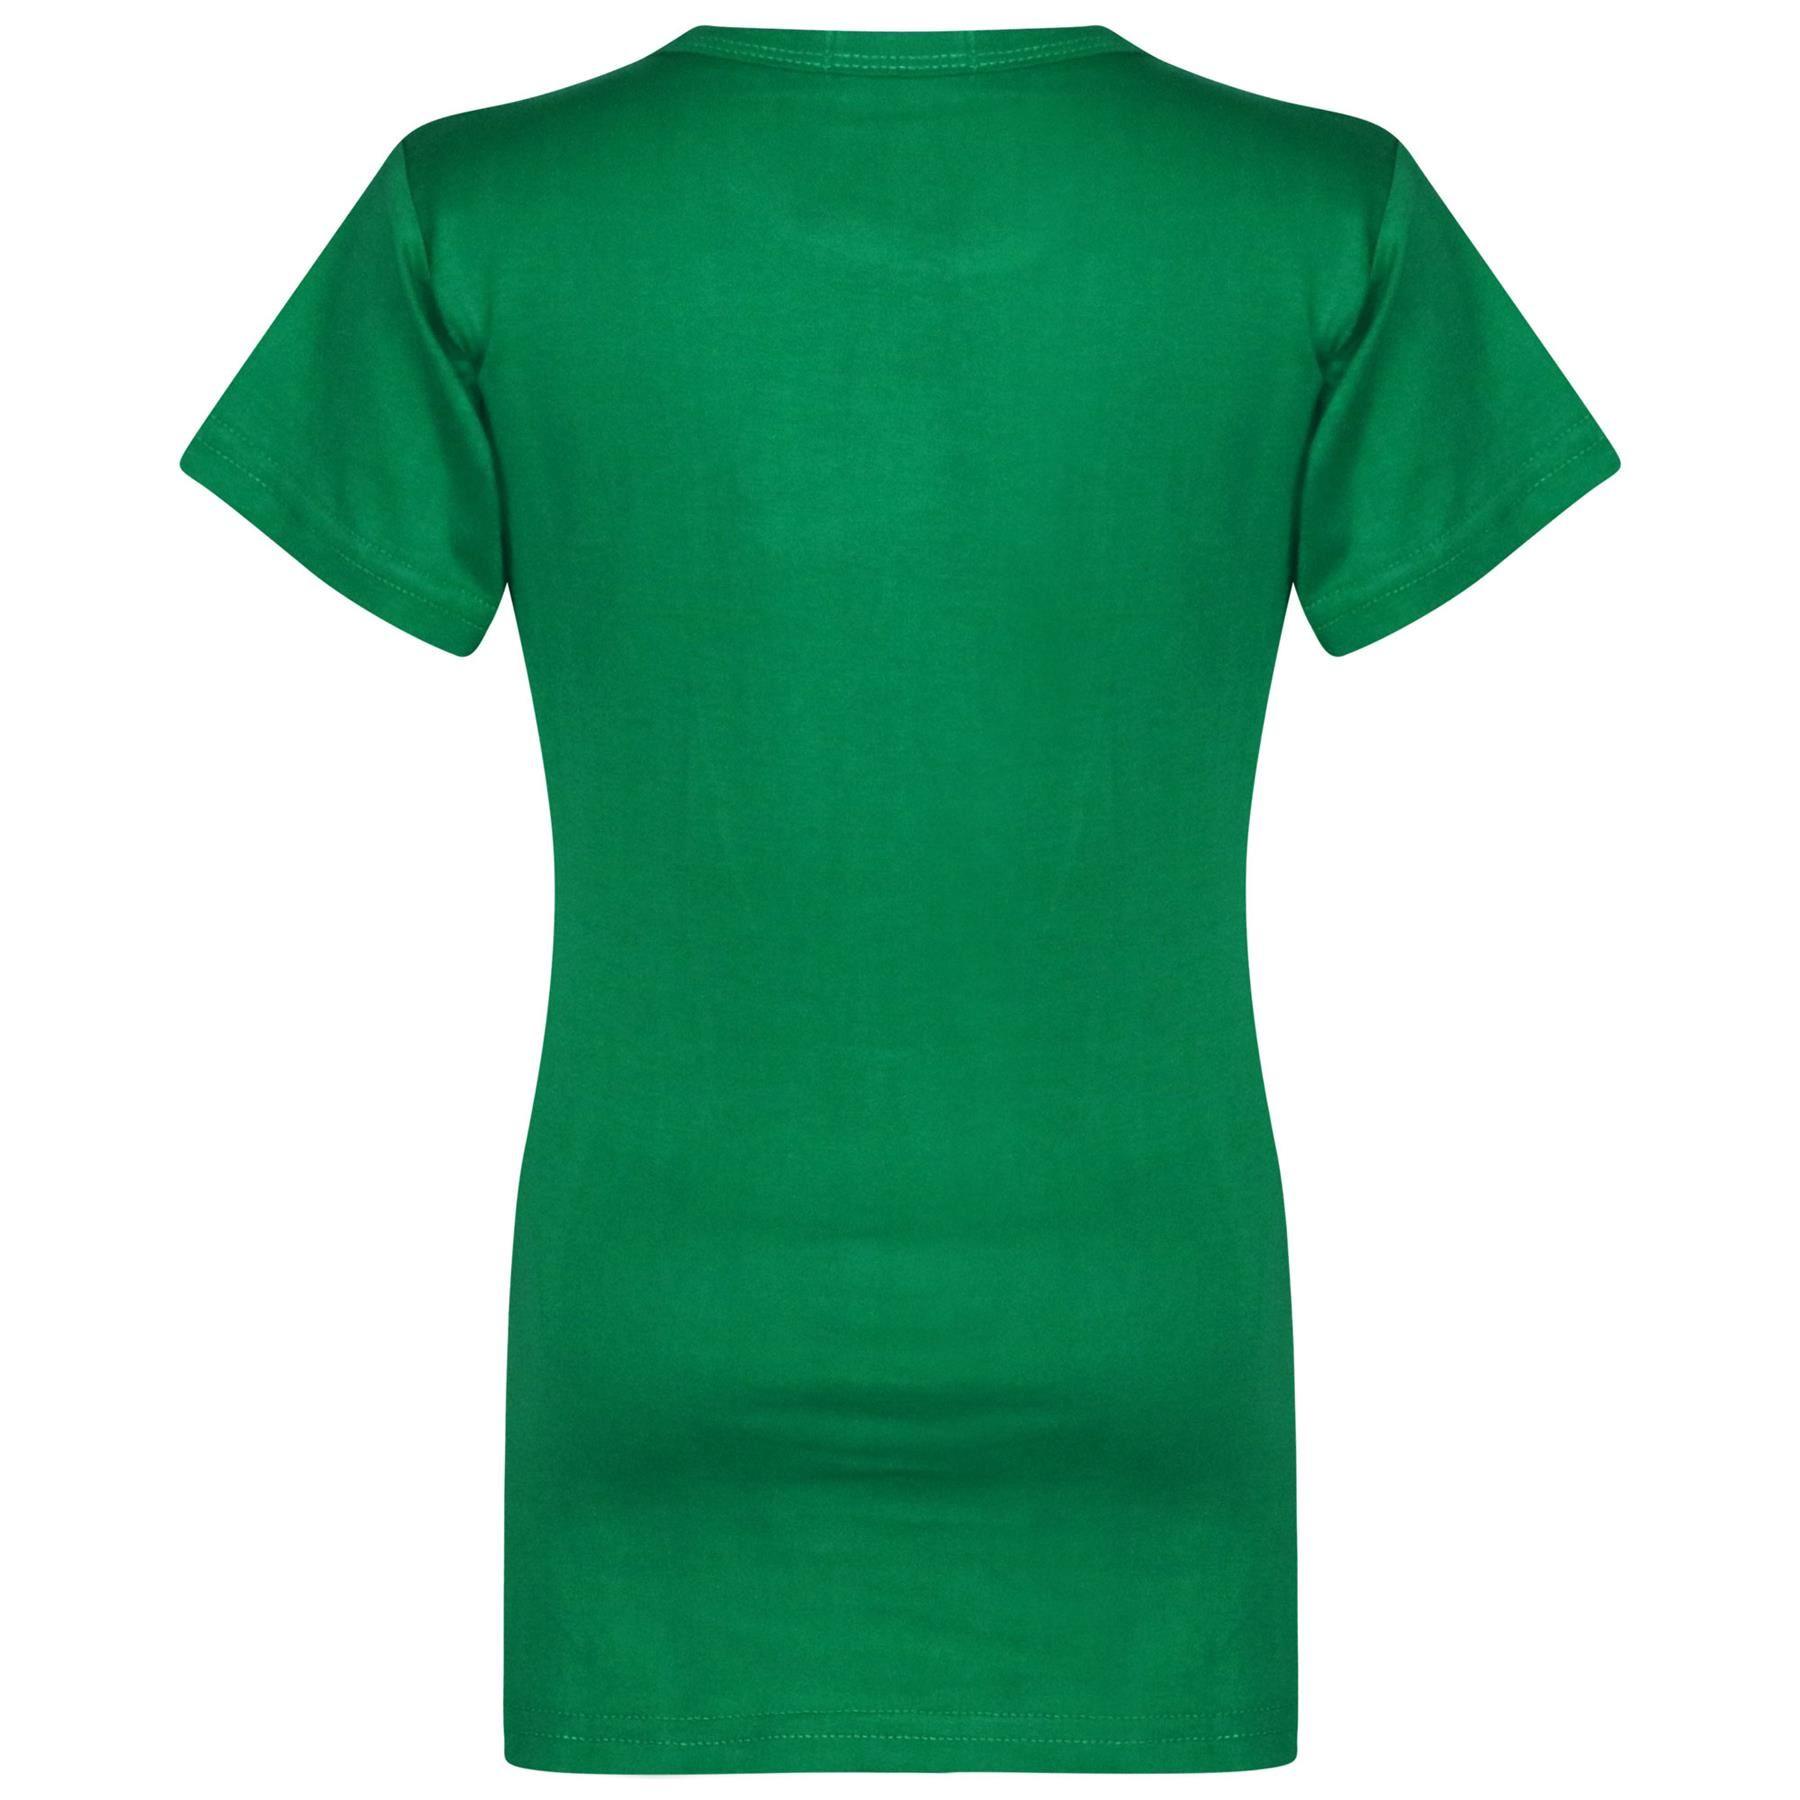 Kids-Girls-T-Shirts-Designer-100-Cotton-Plain-School-T-Shirt-Top-New-Age-3-13Yr thumbnail 18